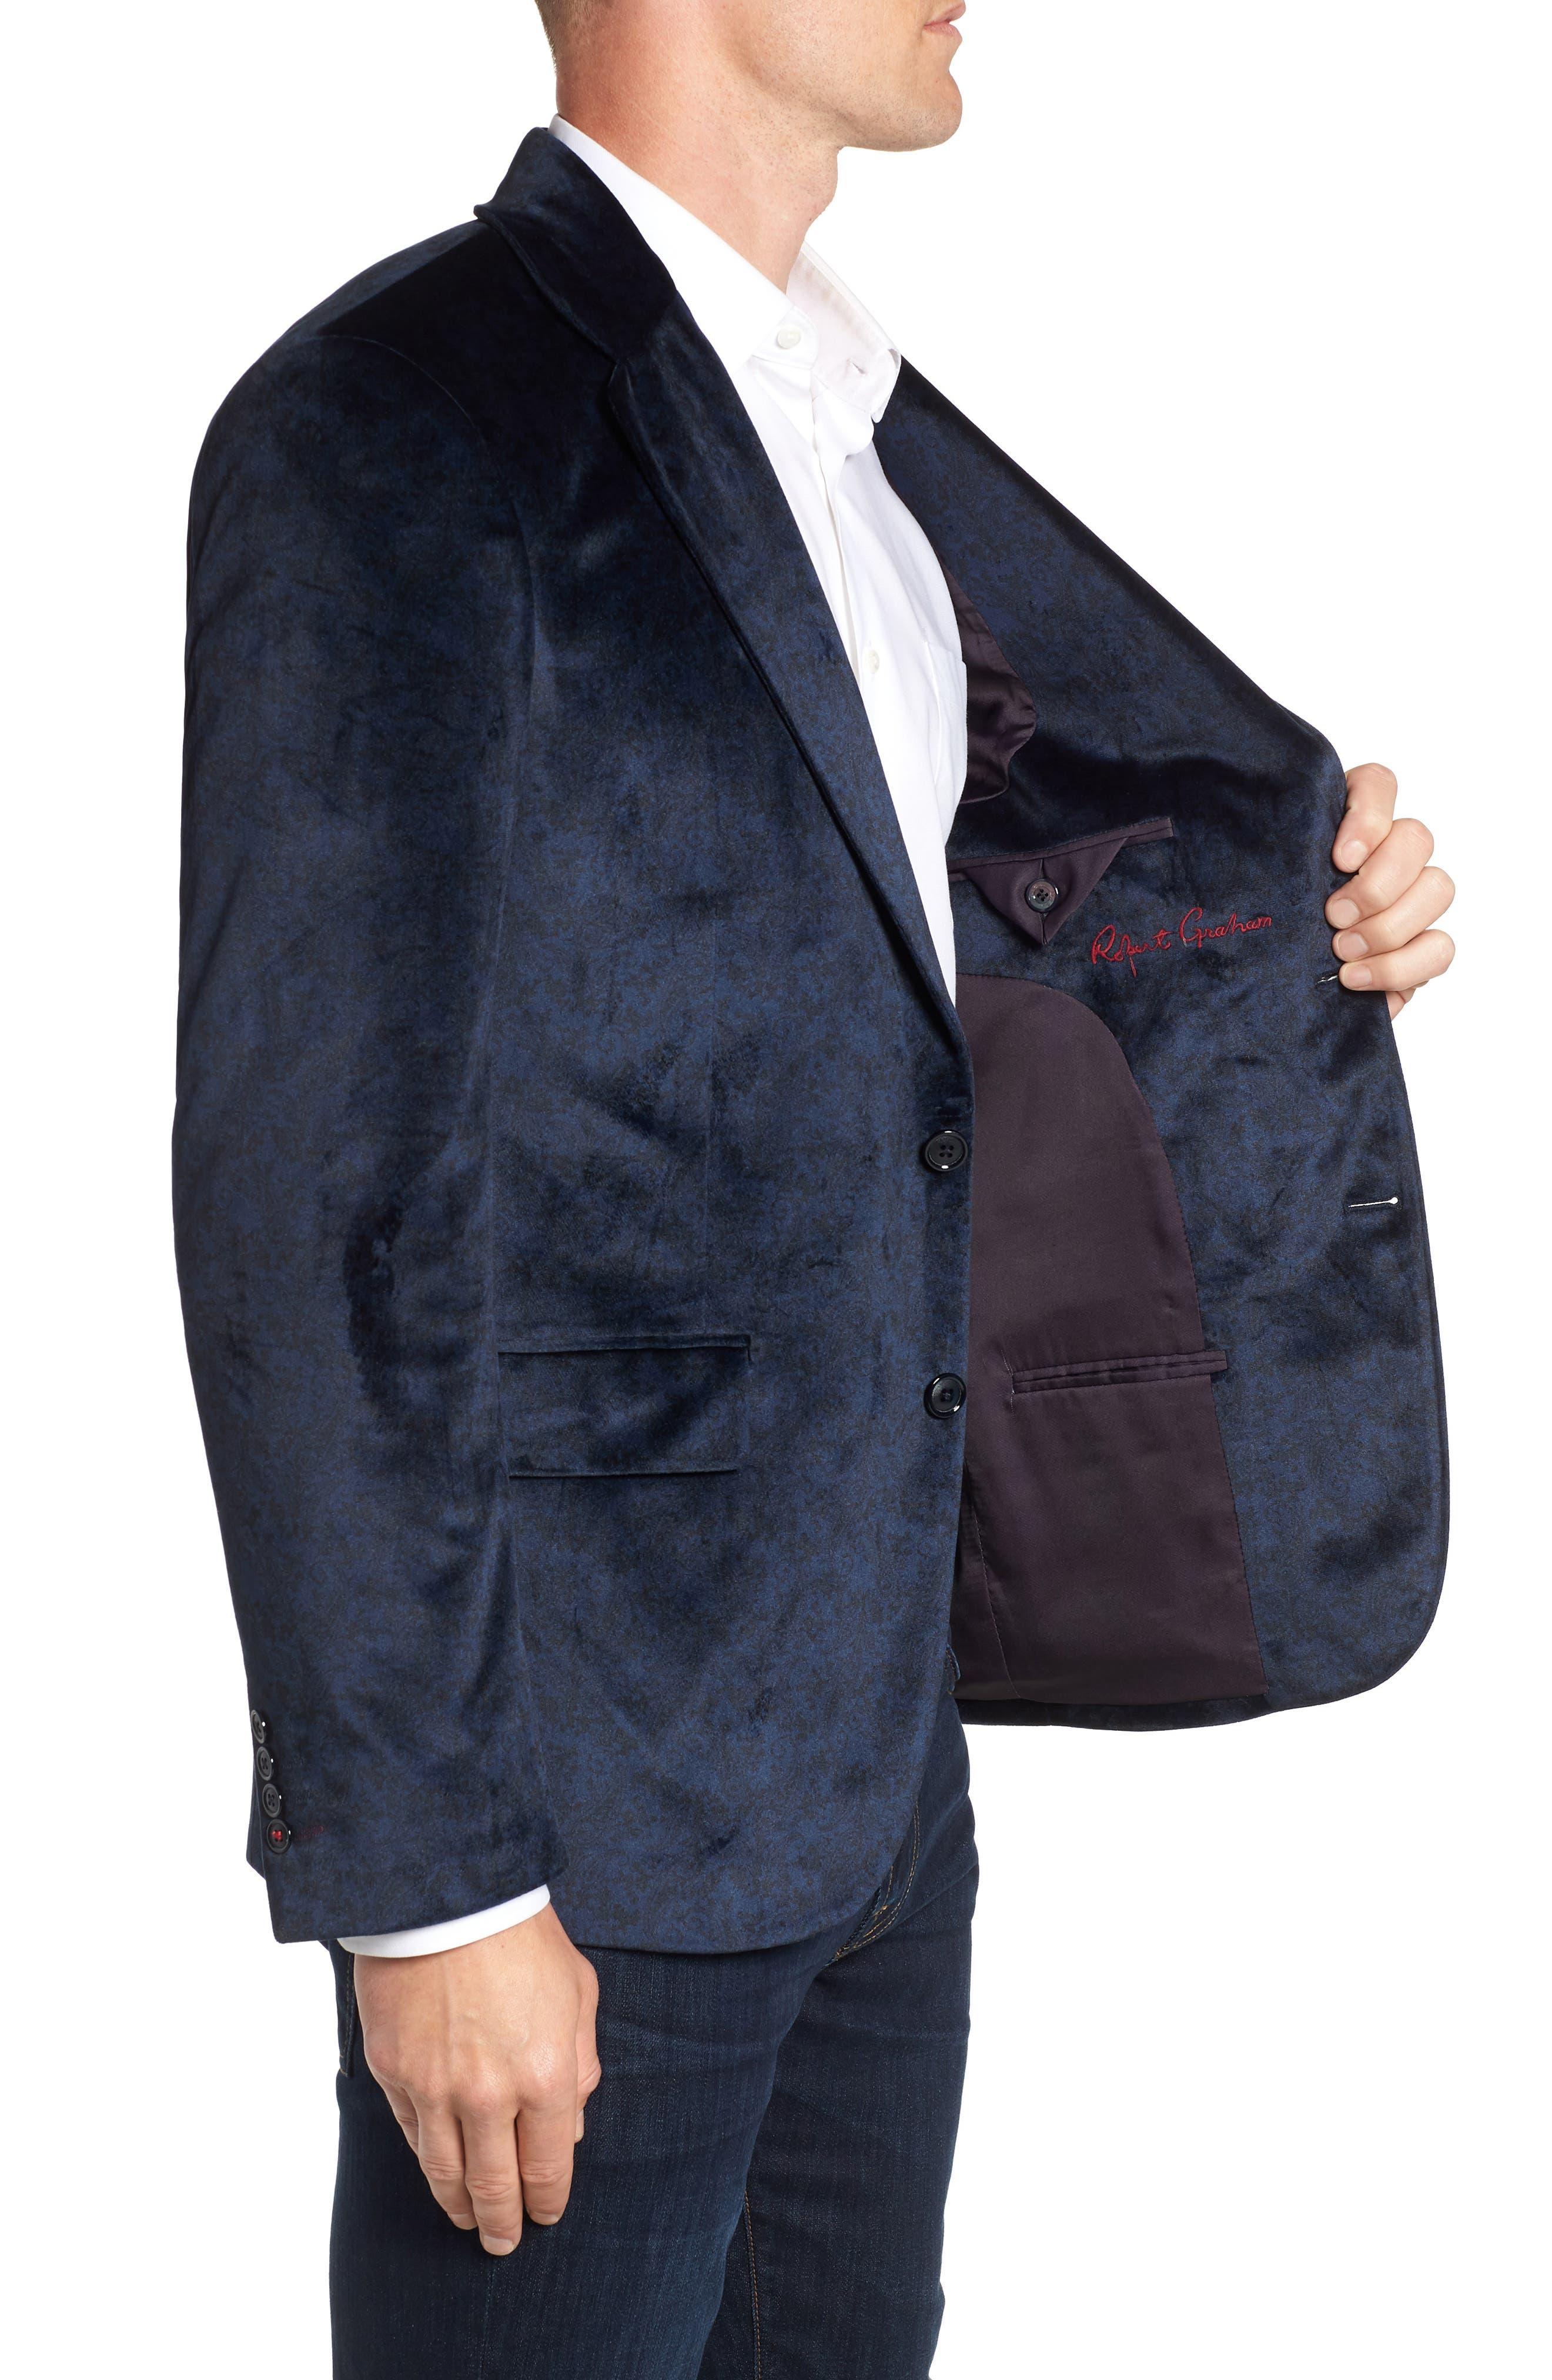 Barton Tailored Fit Blazer,                             Alternate thumbnail 3, color,                             NAVY